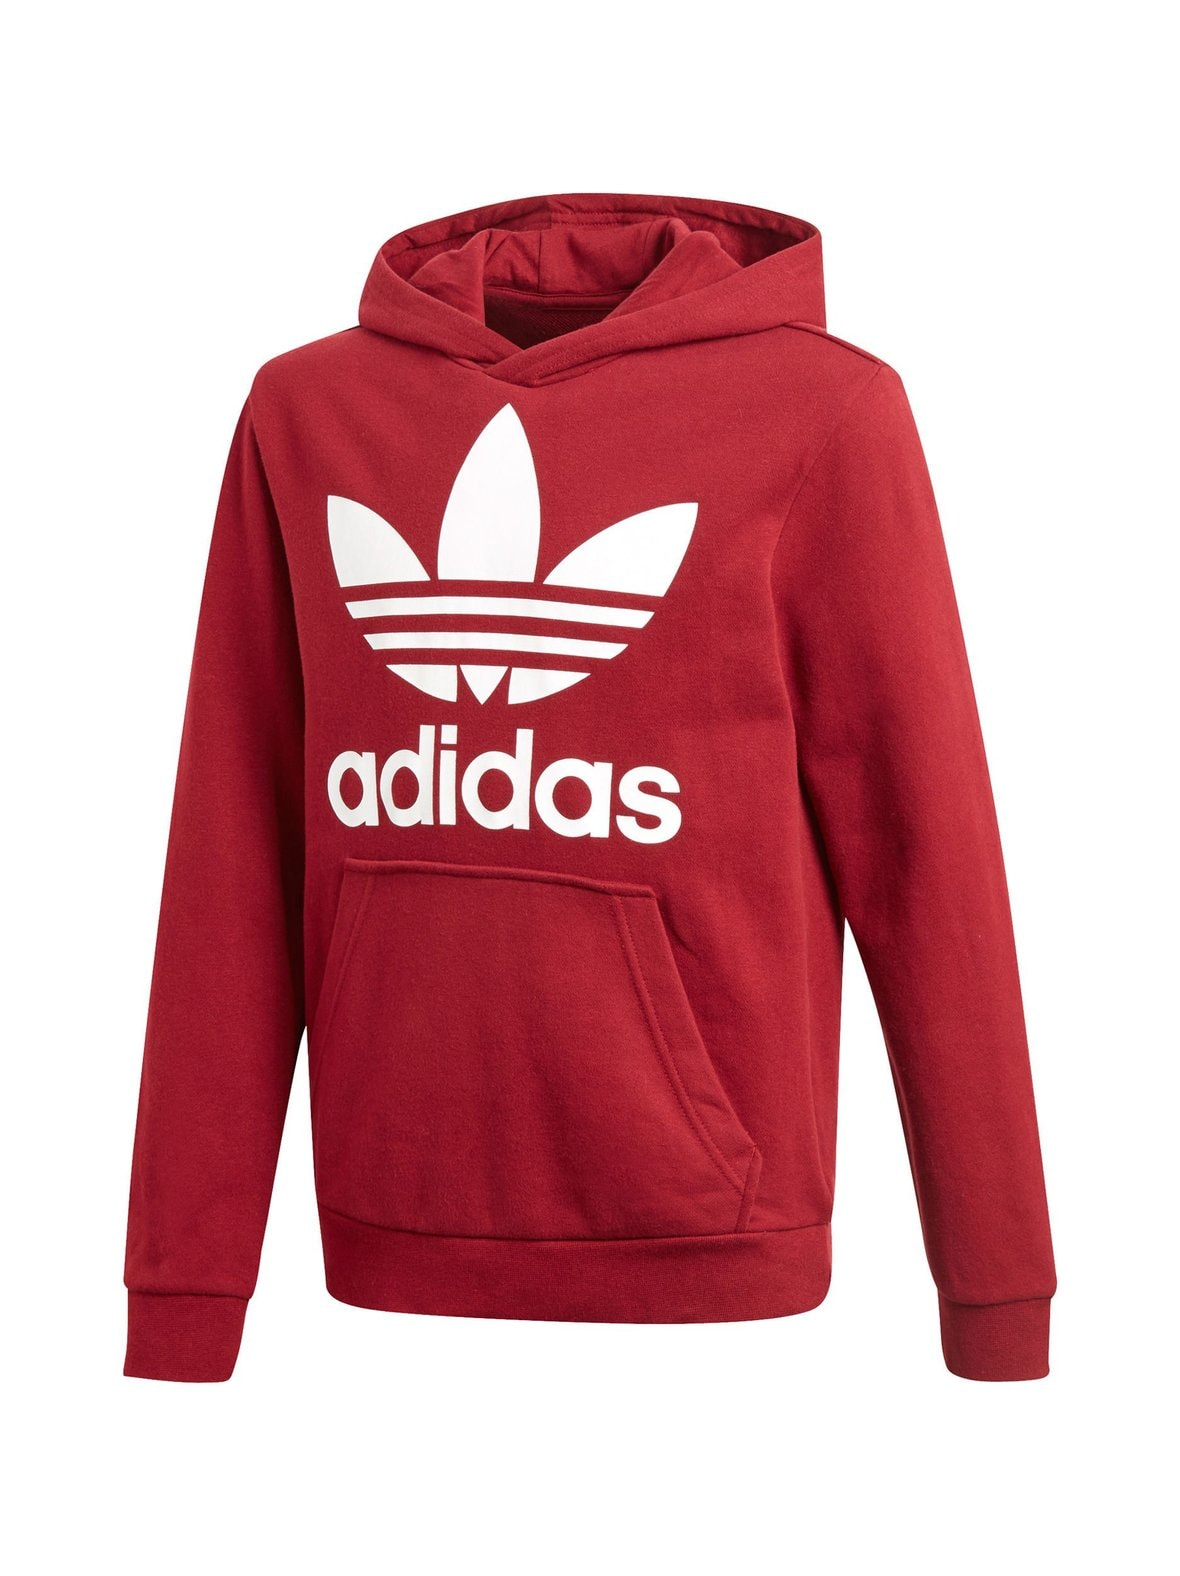 Burgundy (punainen) Adidas Originals Trefoil-huppari CD6501  da995c6aac